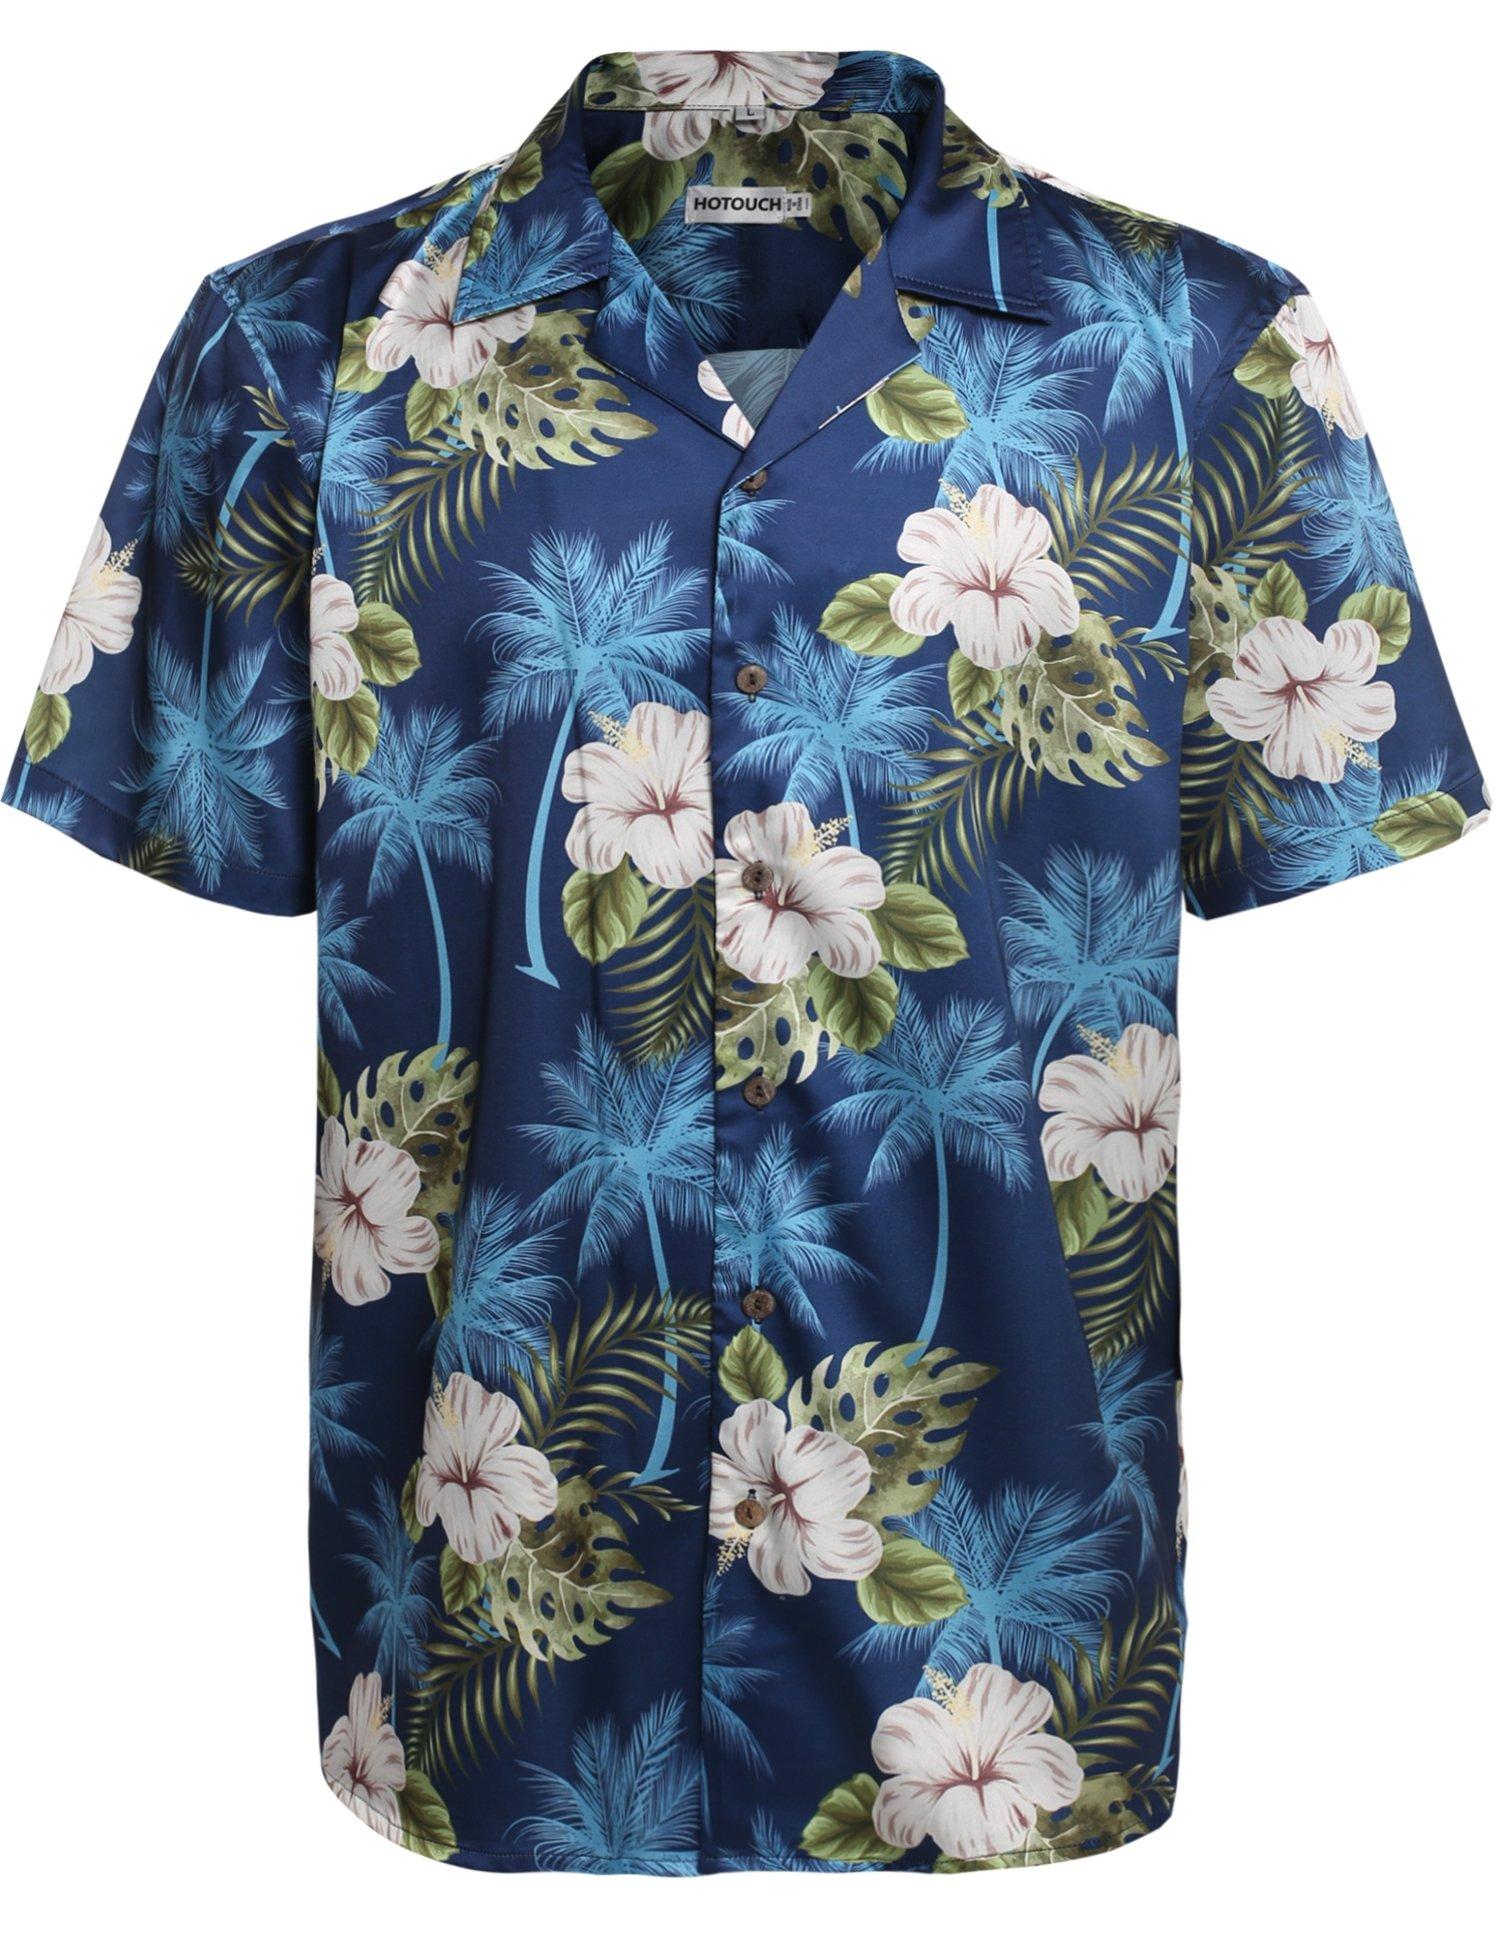 HOTOUCH Mens Hibiscus Shirt Aloha Hawaiian Shirt Navy Blue L